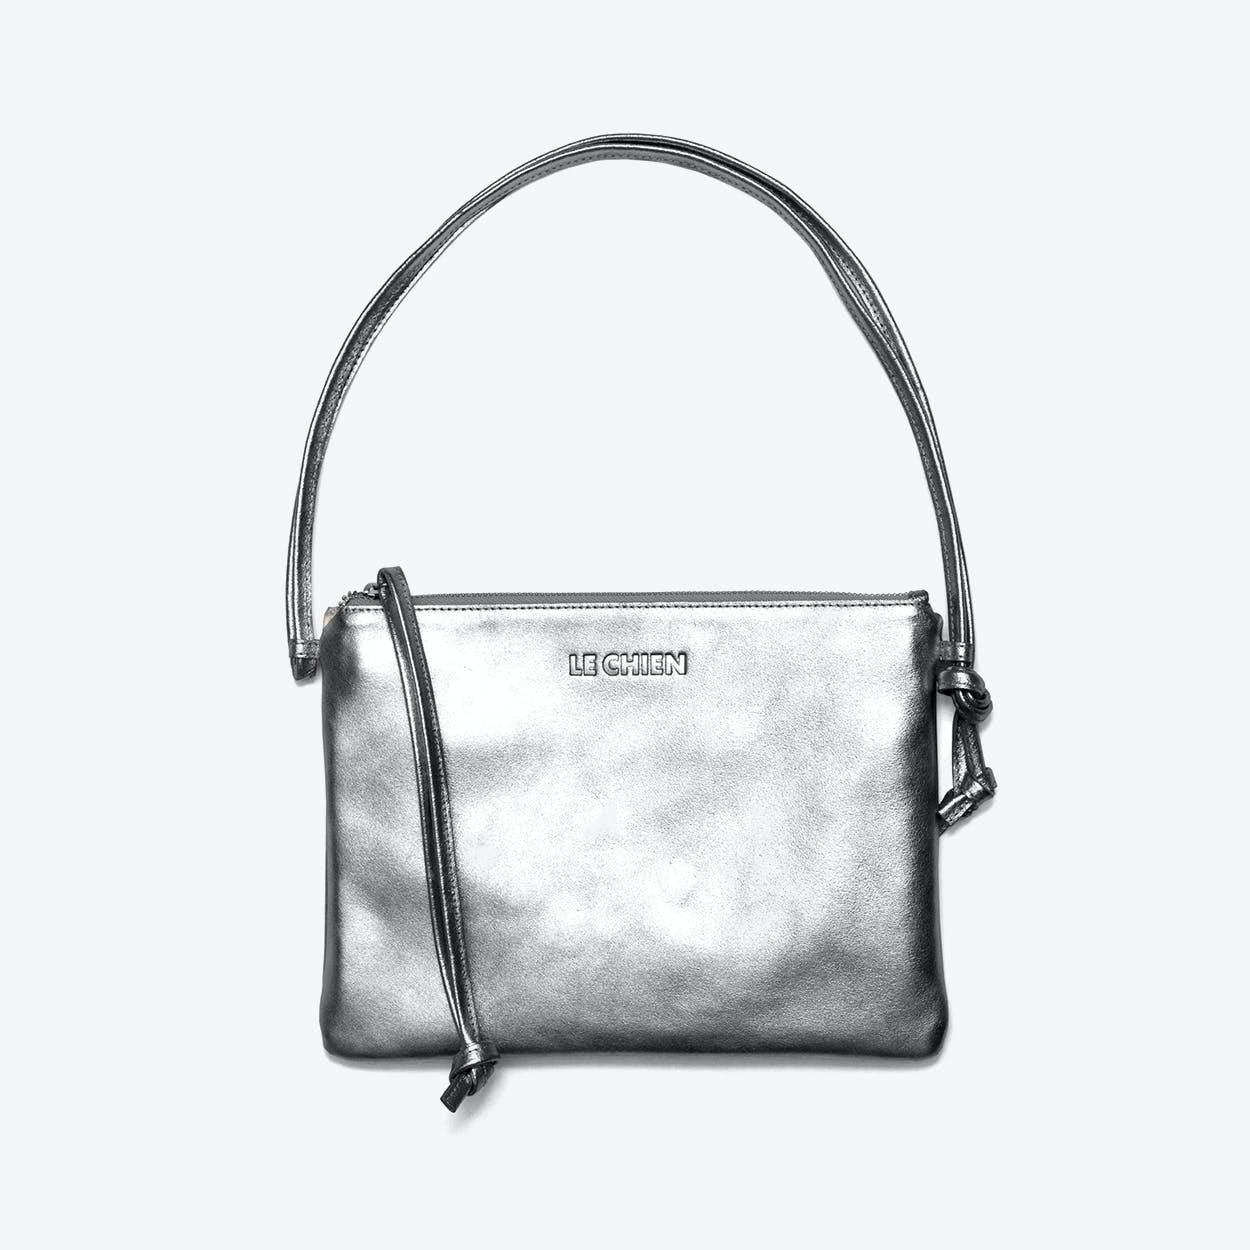 Pinscher Crossbody Bag in Silver/Metallic